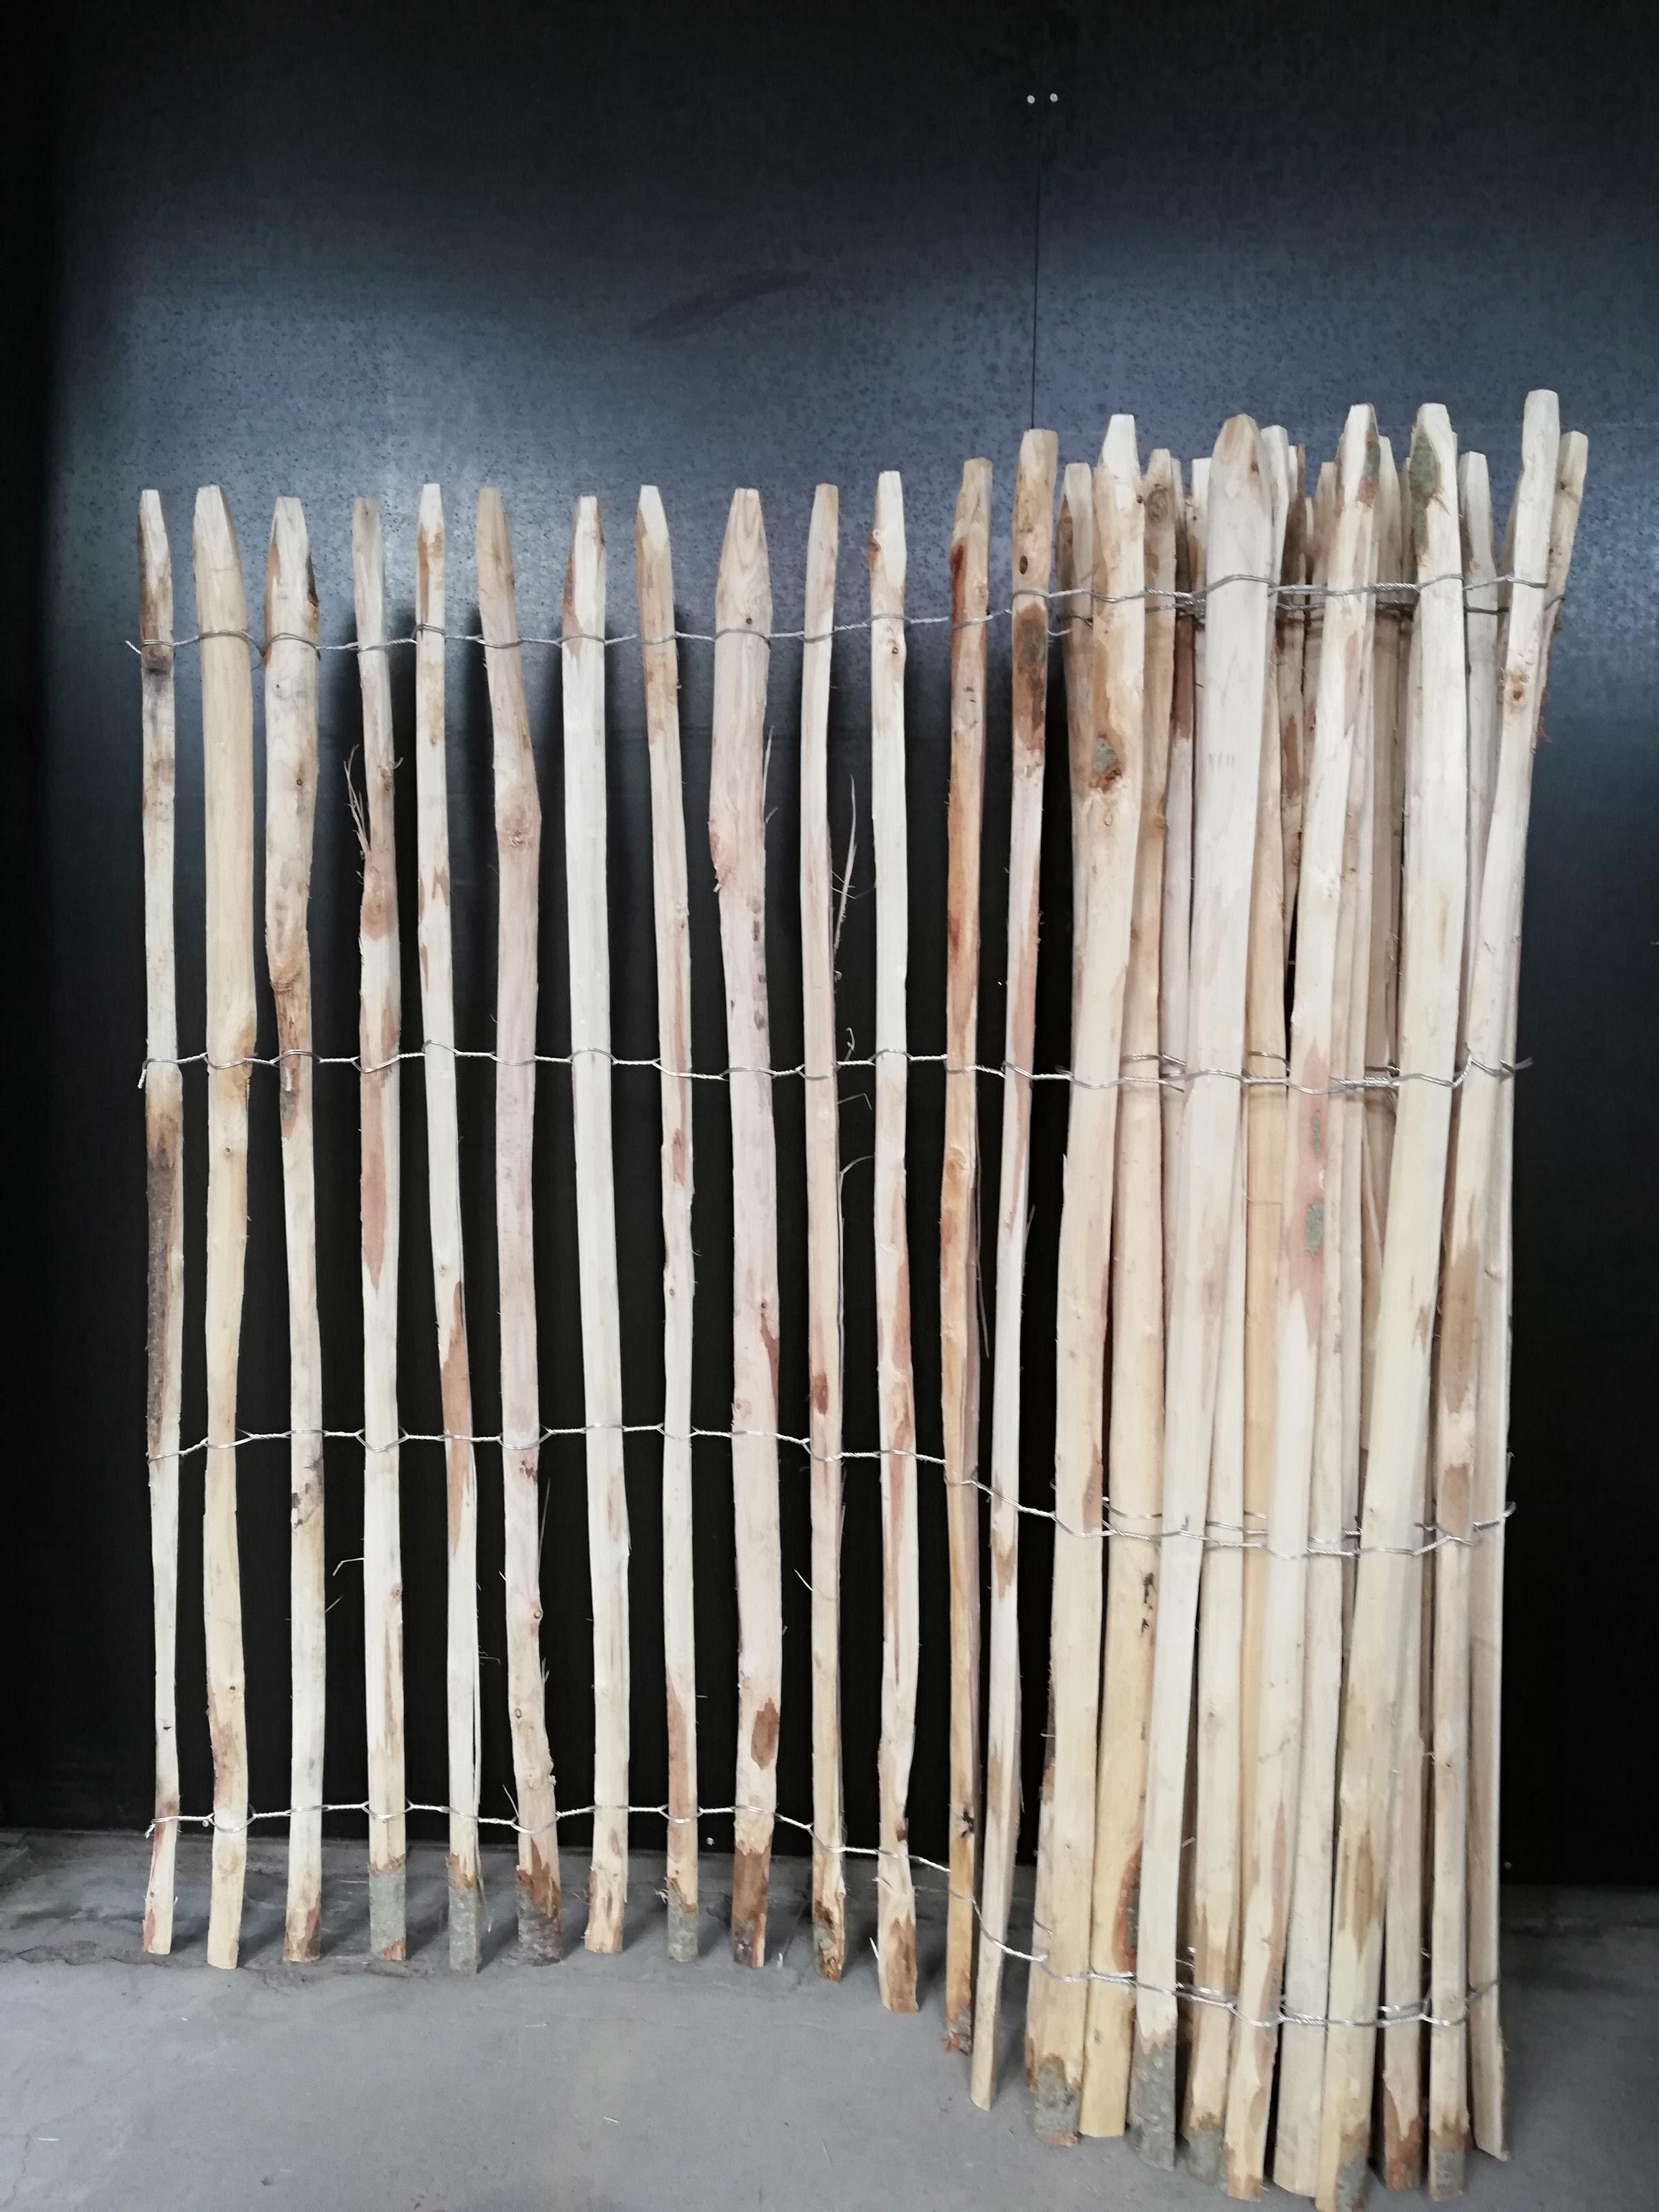 kastanienholz 150 cm h - 5 m l - za 4/5 cm, staketenzaun